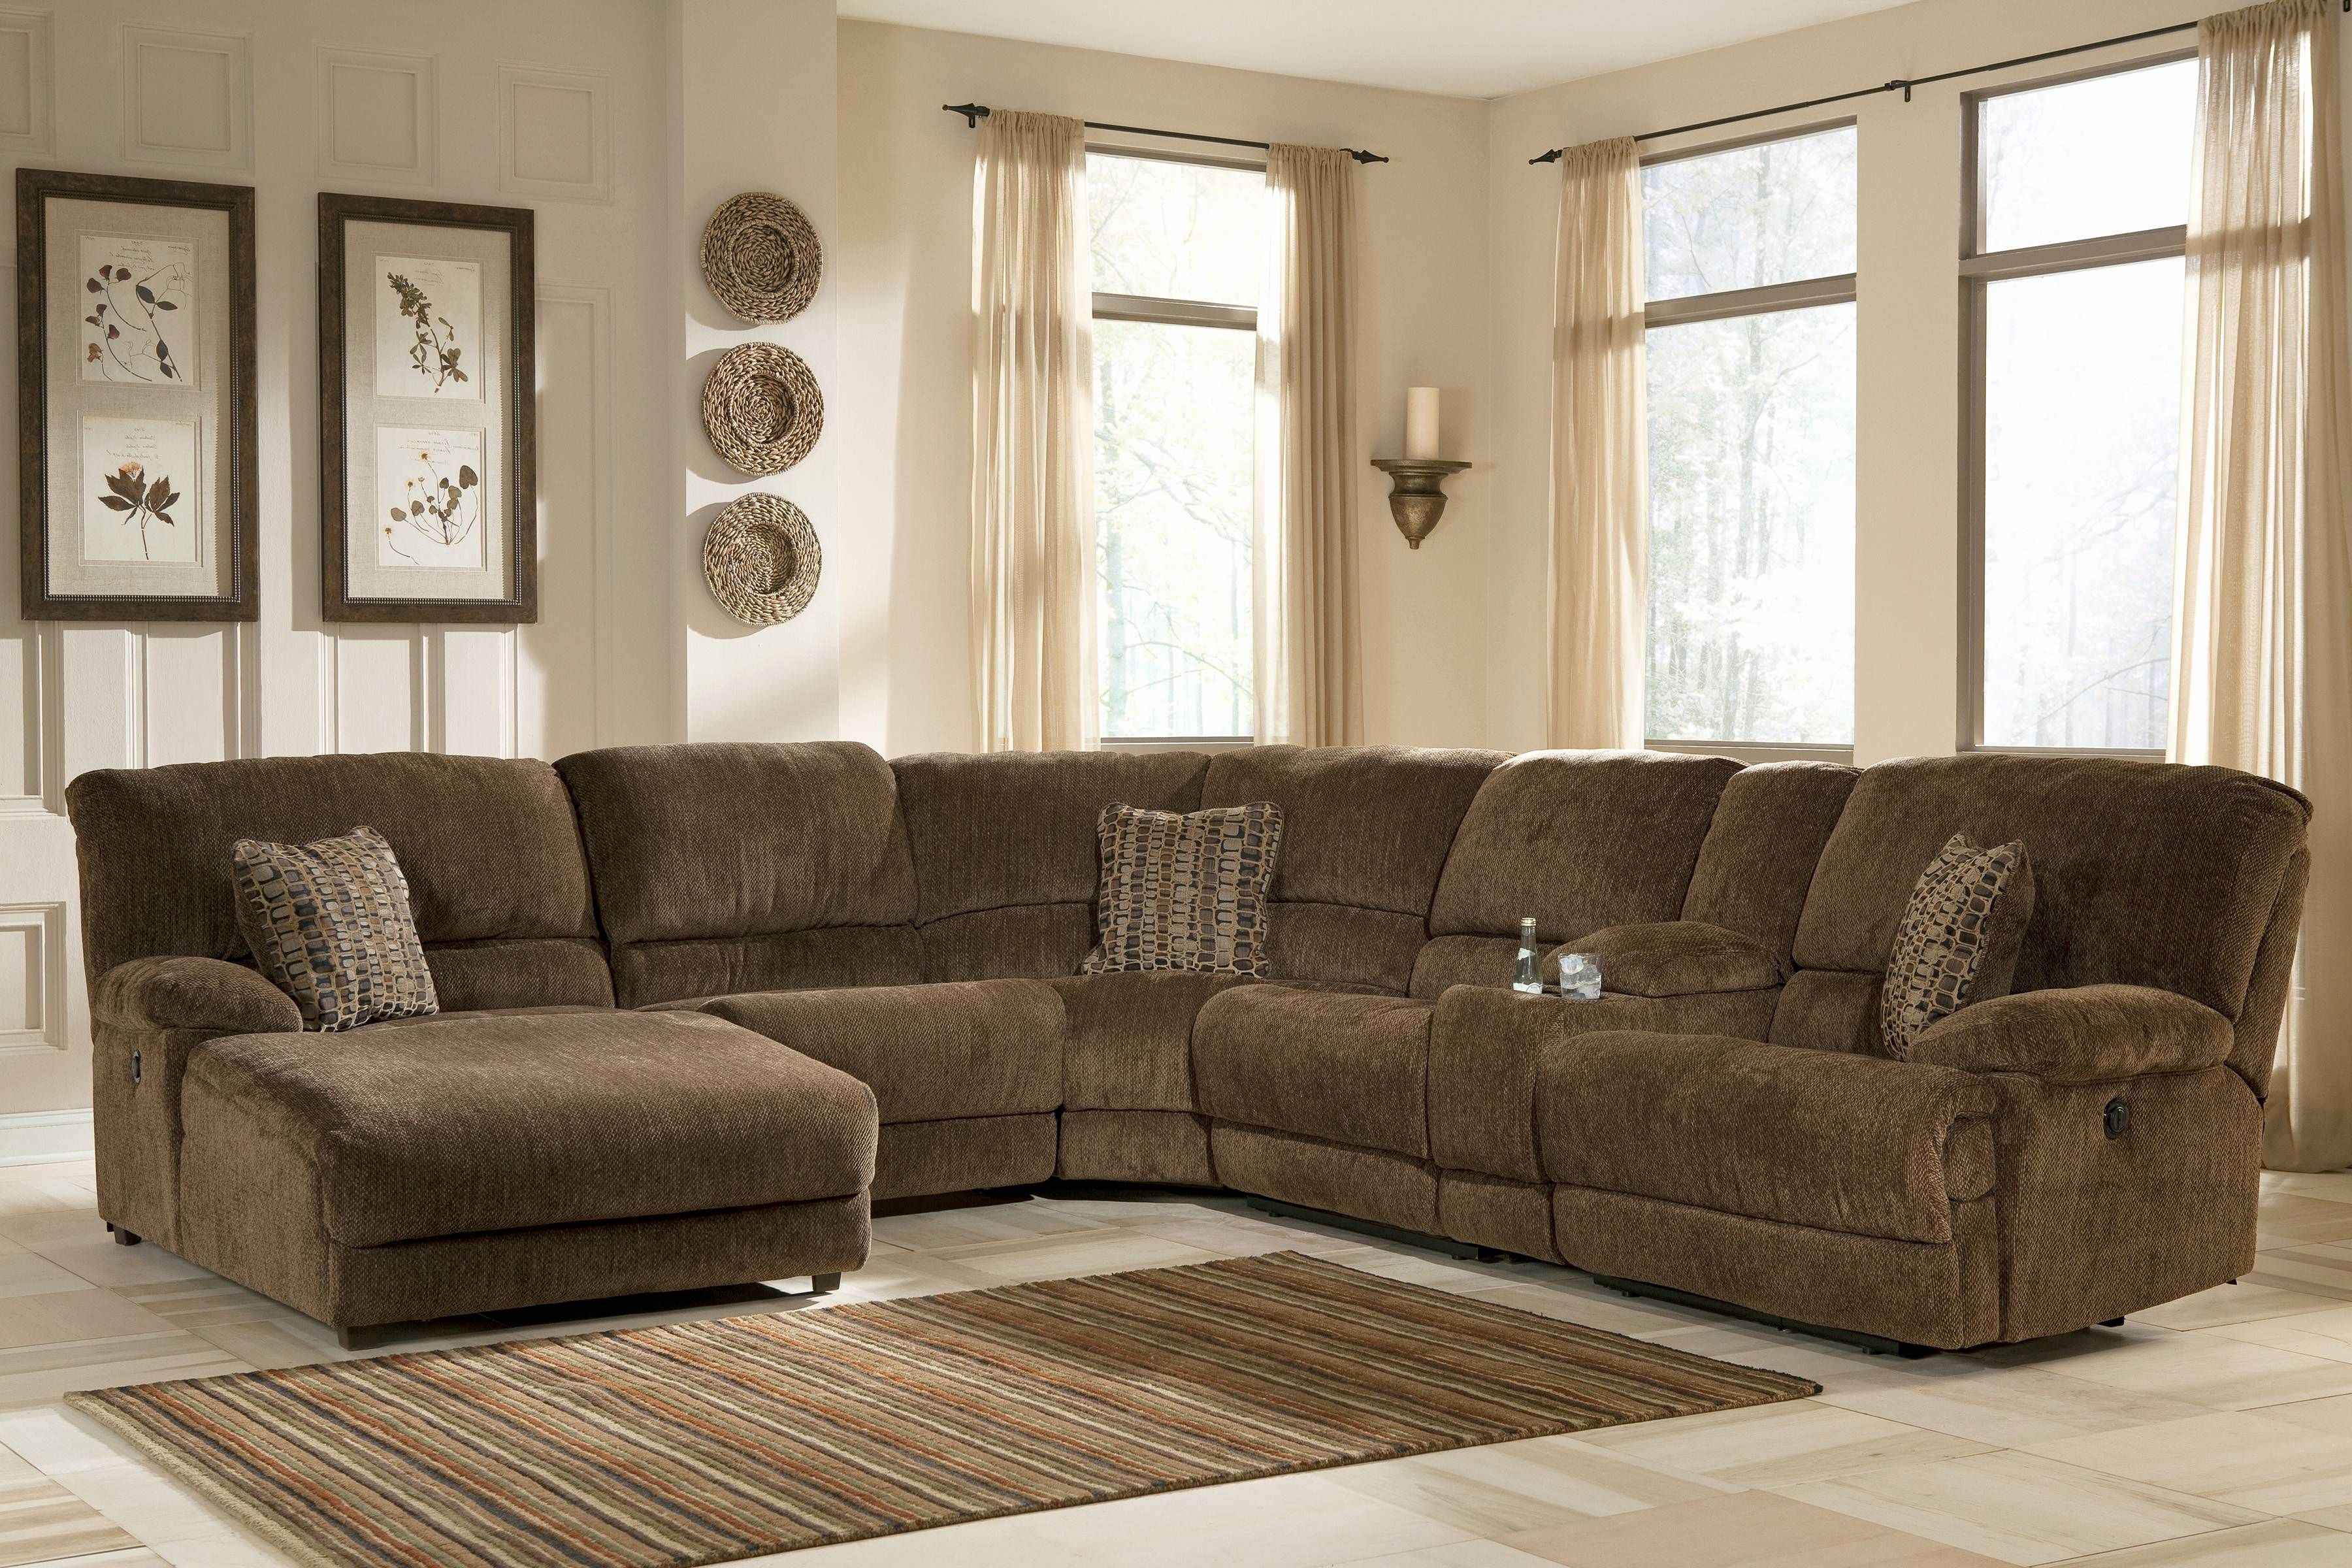 bauhaus sofas cama sofa bed wood design awesome sectional microfiber 30 best ideas of sleeper